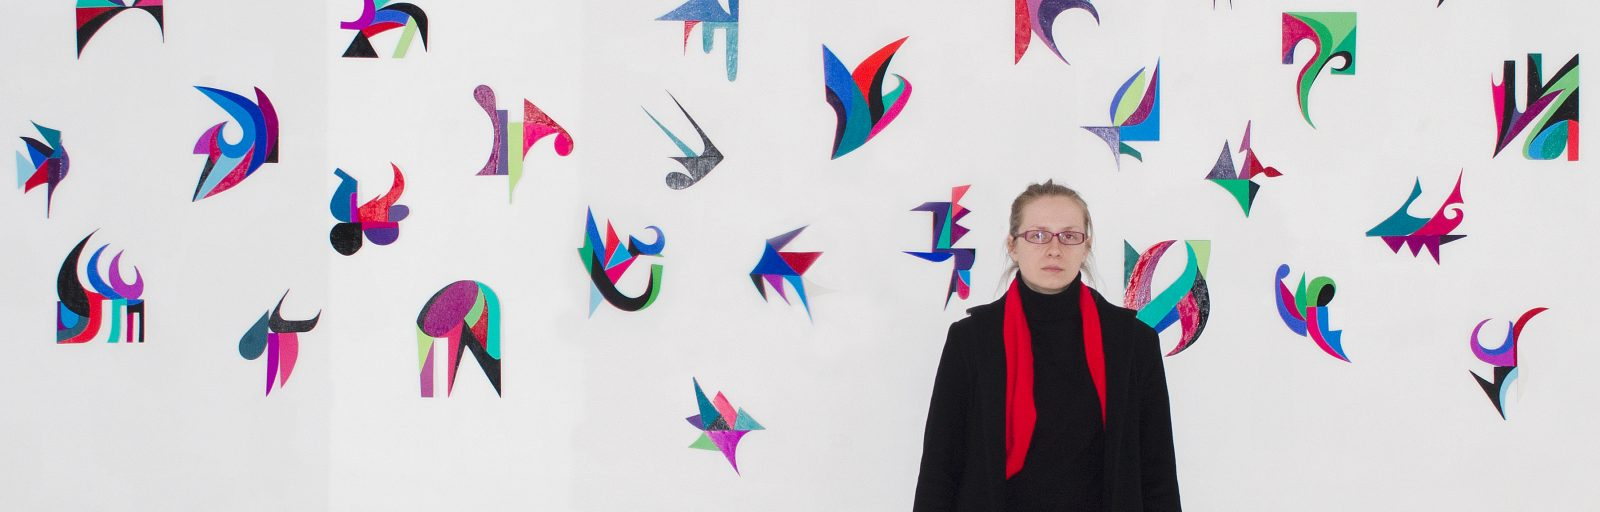 NÖ Waldviertel Galerie Kunst - Jelena Micić